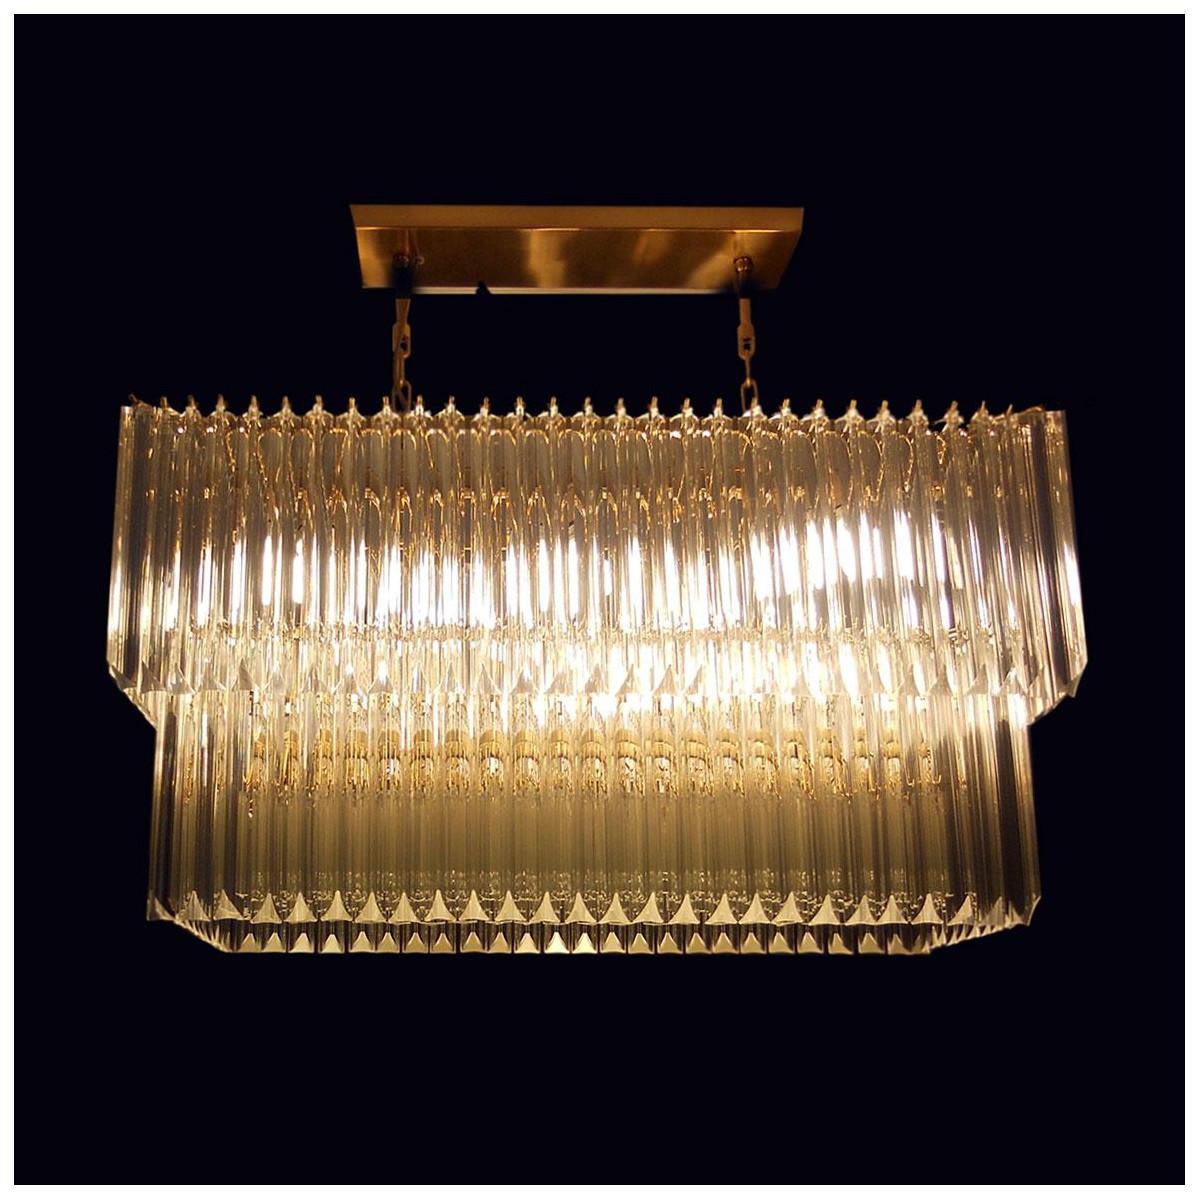 """Anita"" lampara de araña de Murano - 10 luces - transparente y oro 24K"